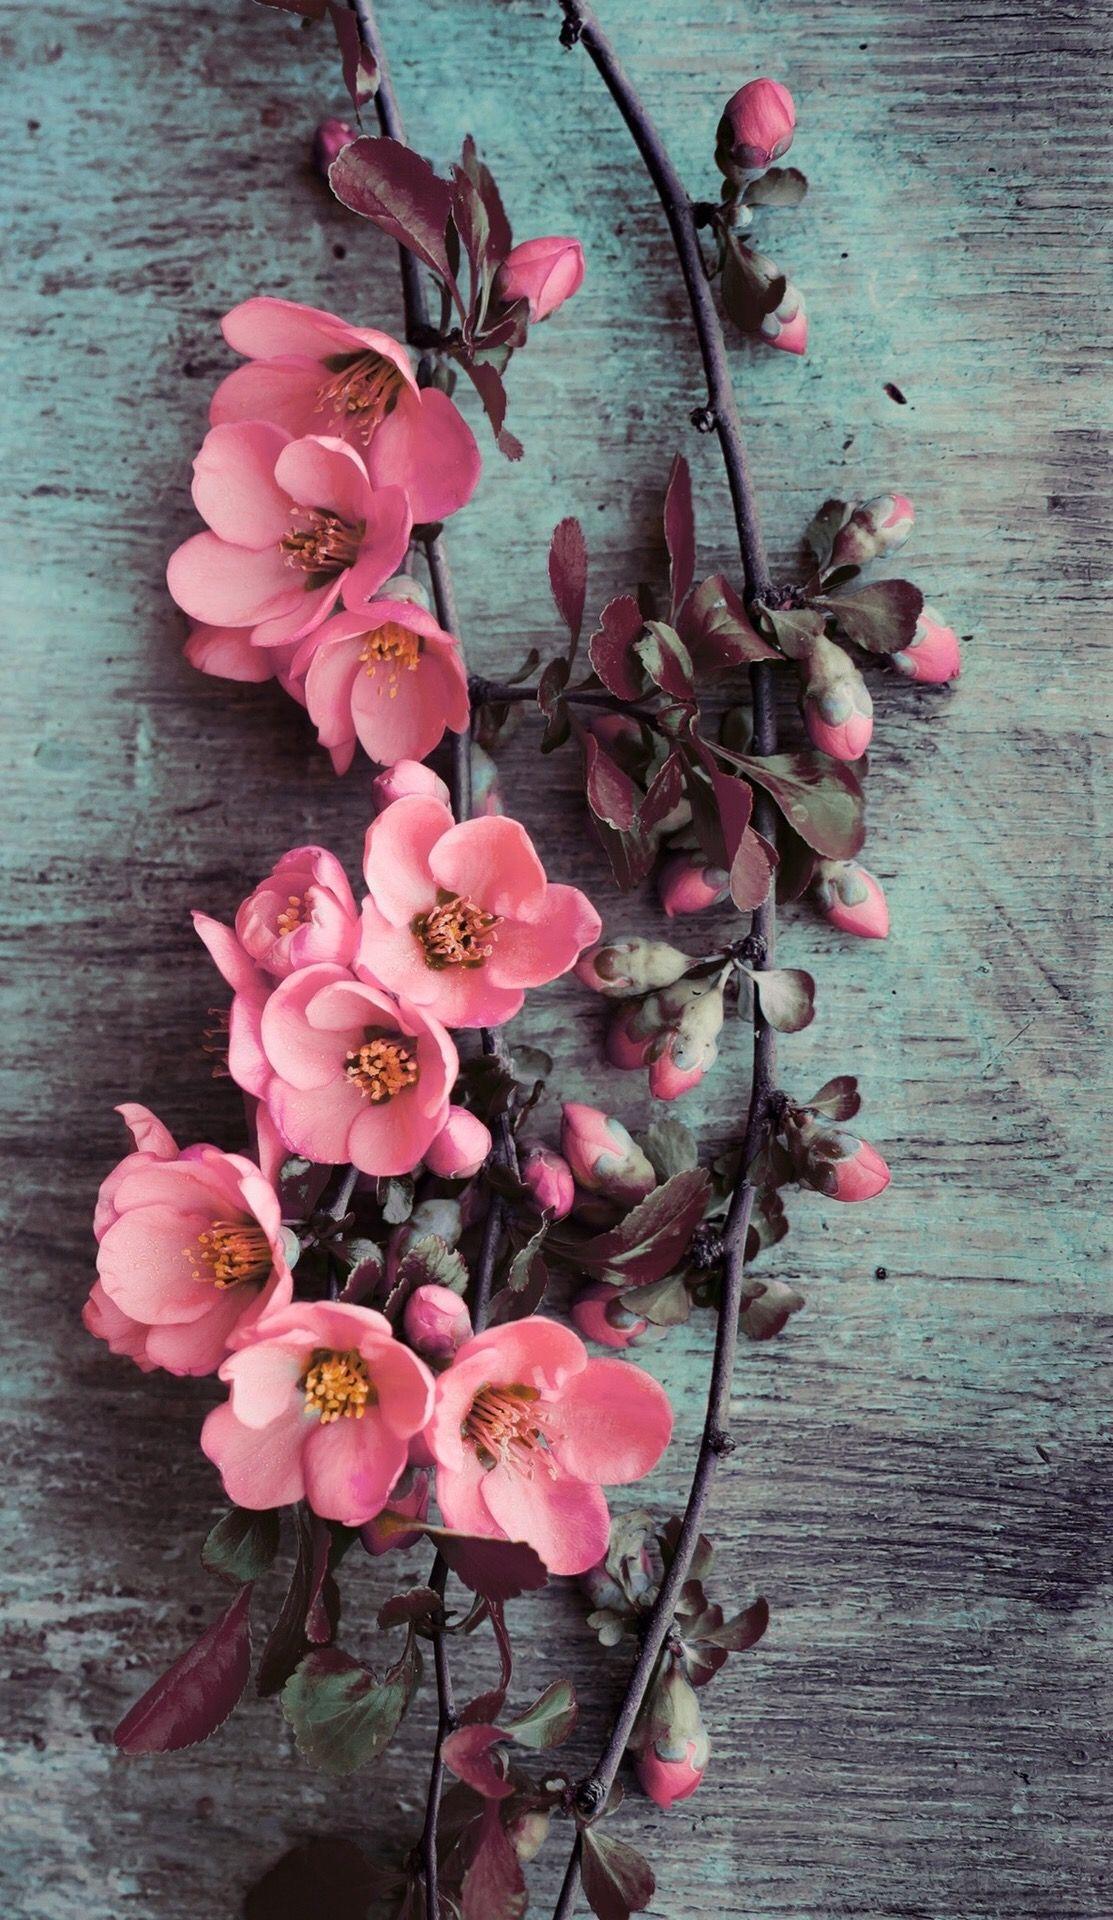 Wallpaper iPhonebeautypink flowers   l  Pinterest  Flowers